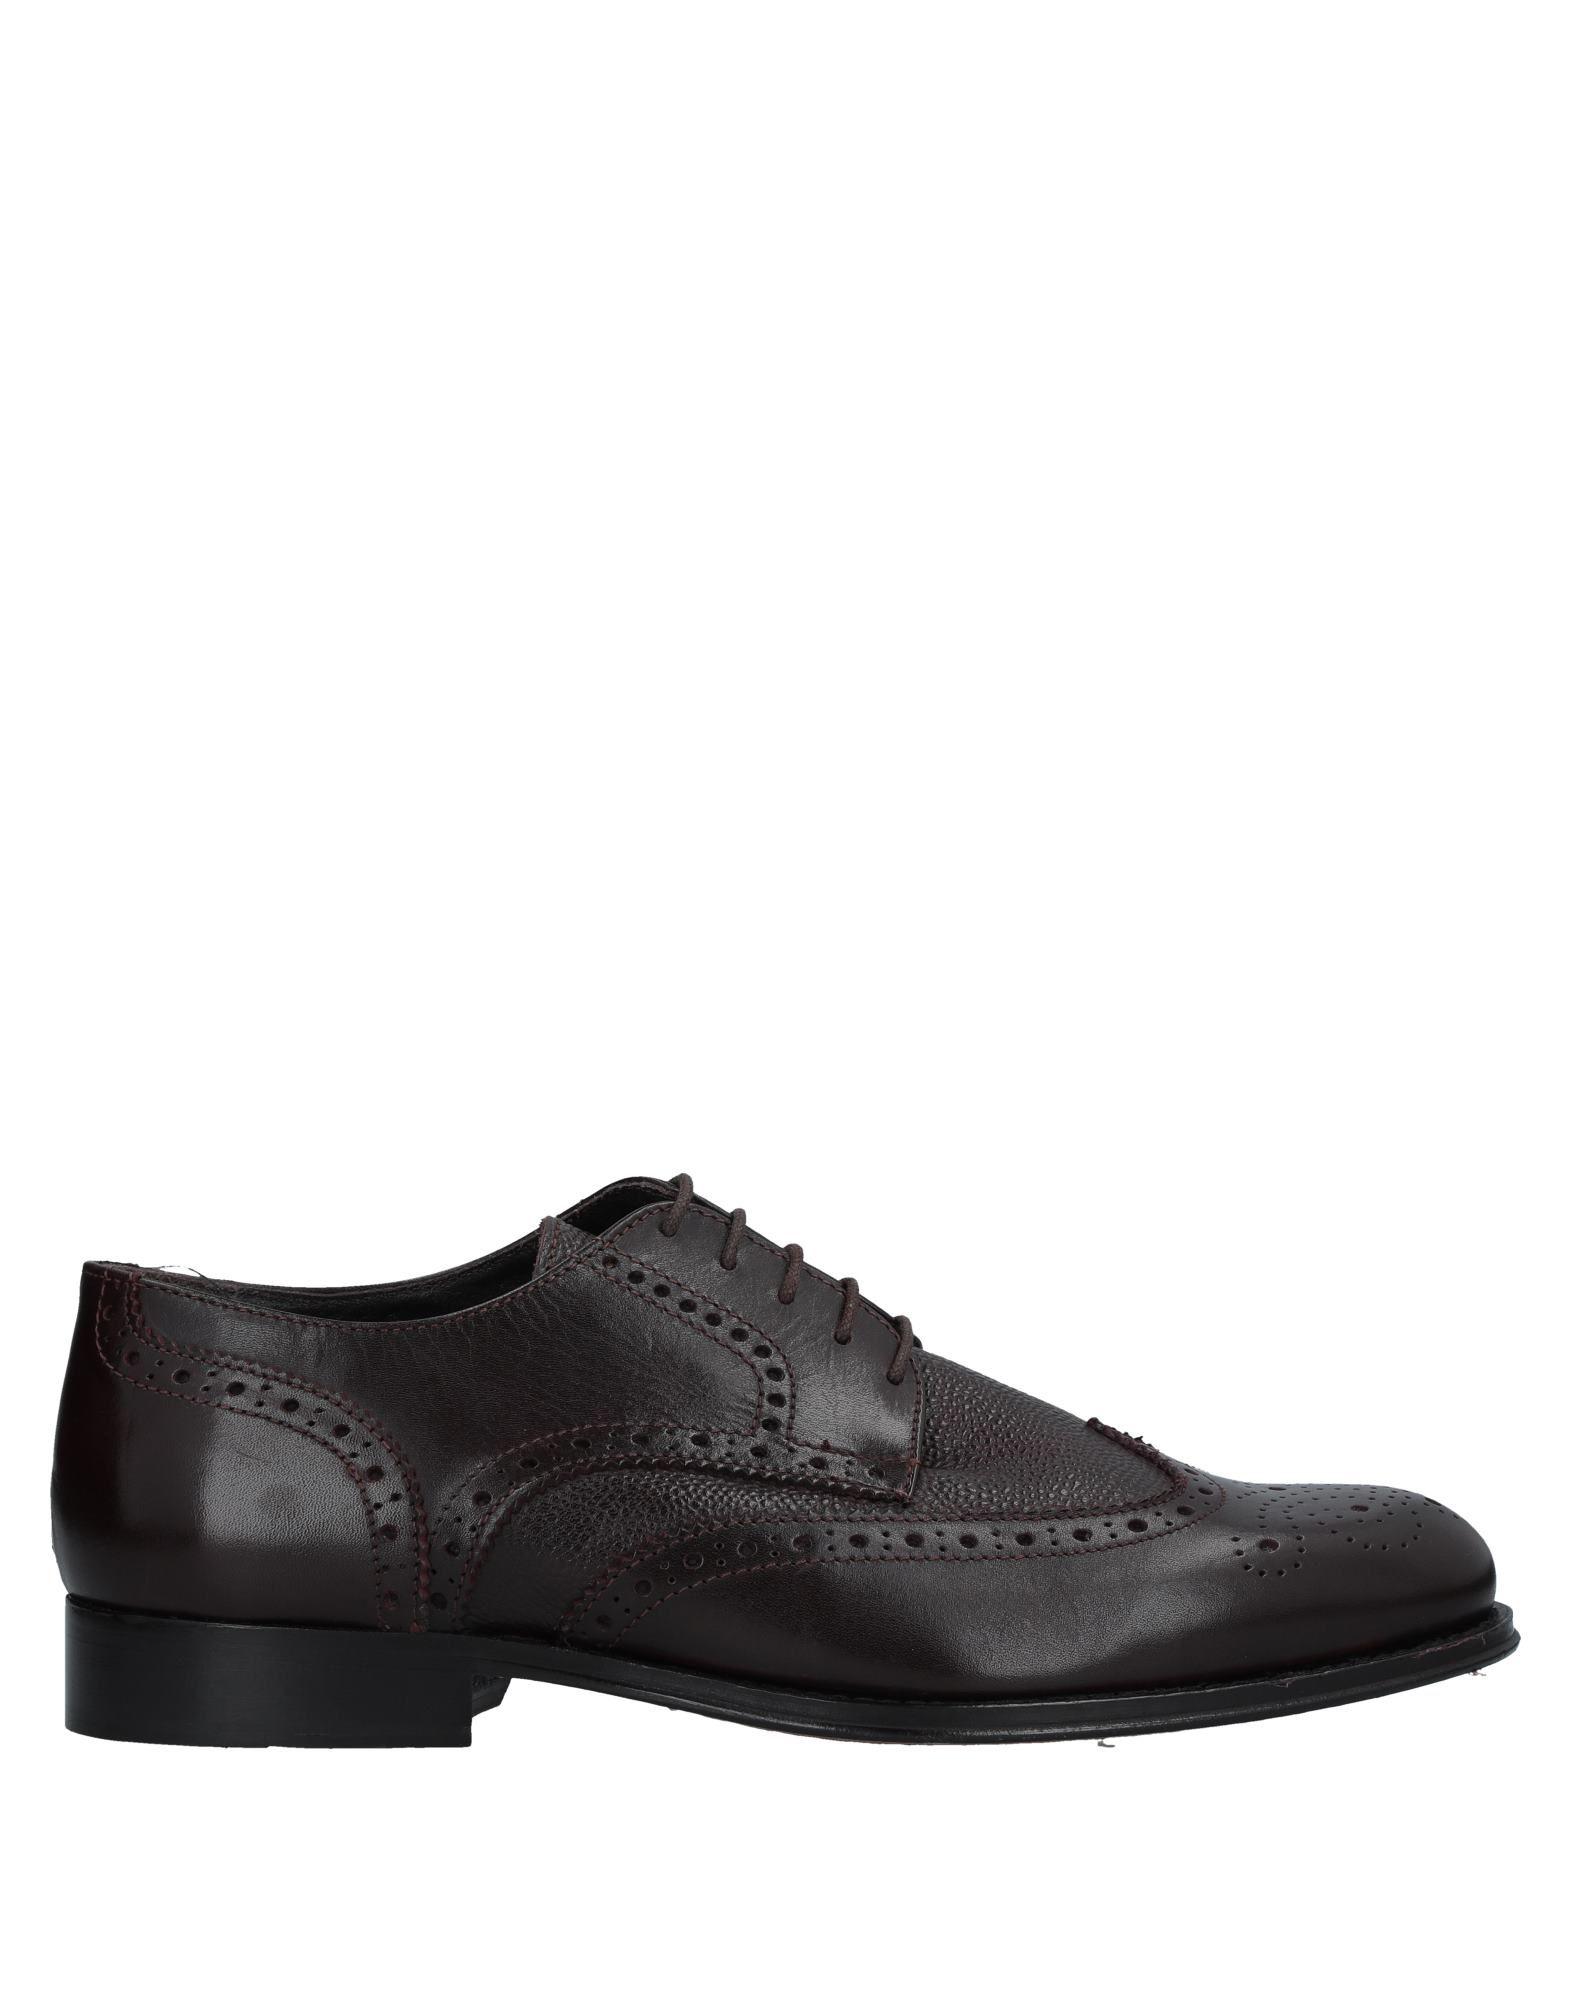 Rabatt echte Schuhe Roberto Della Croce Schnürschuhe Herren  11533449ND